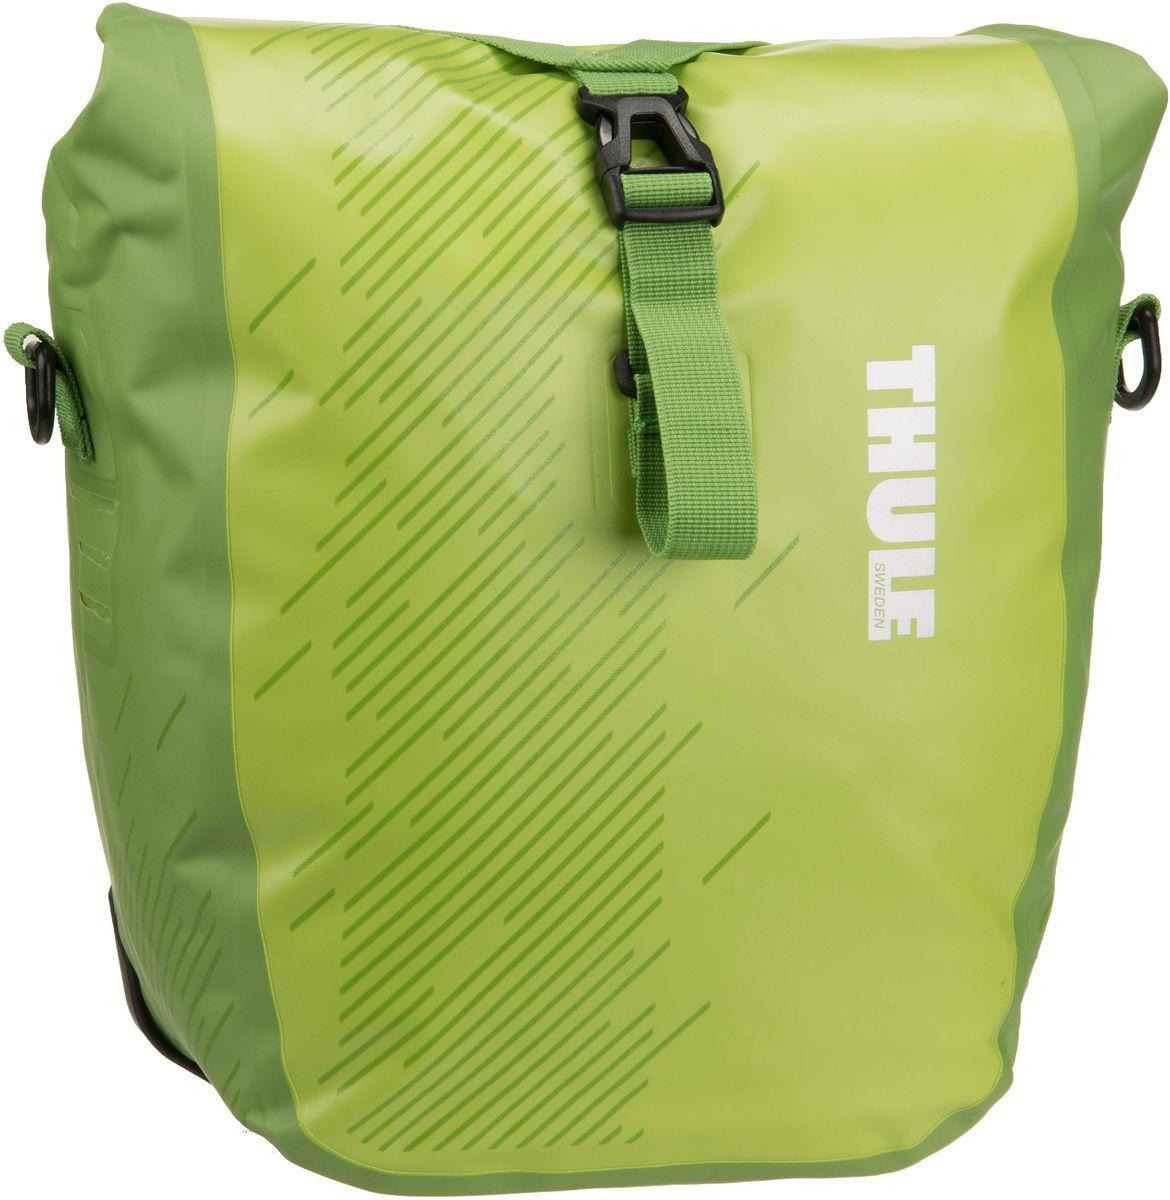 Thule Shield Pannier S Chartreuse - Fahrradtasche Sale Angebote Hornow-Wadelsdorf